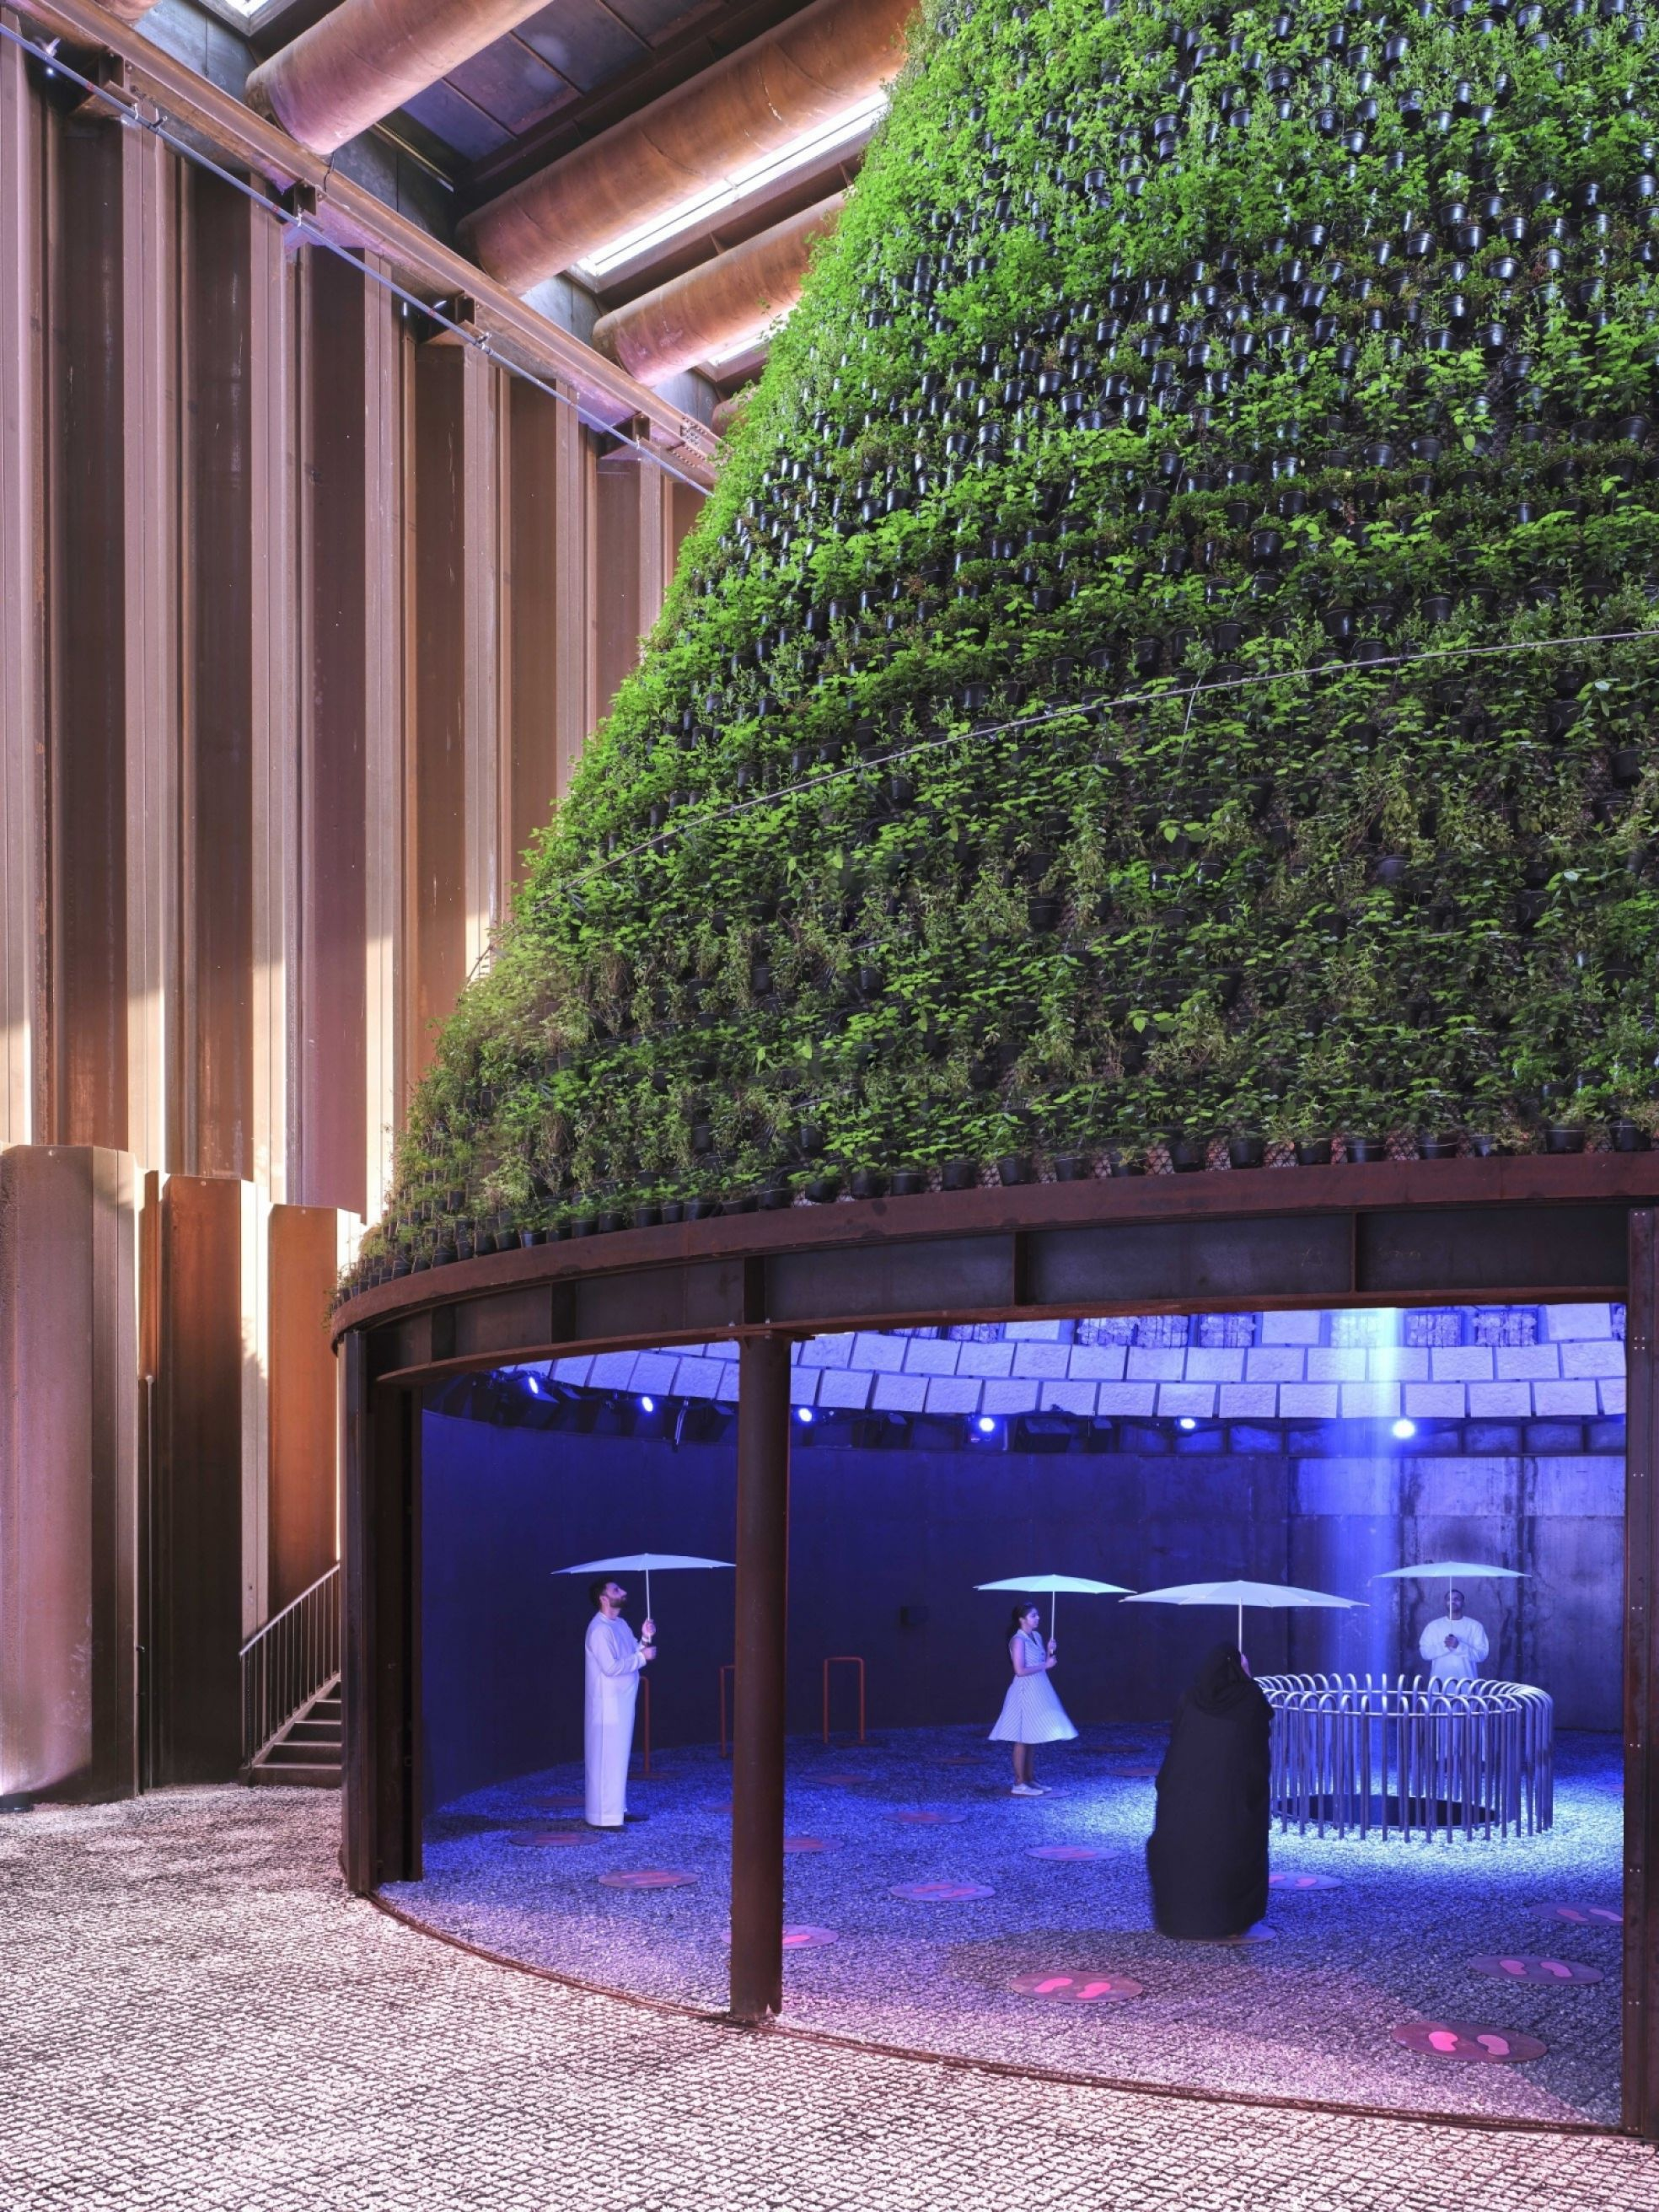 Dubai Expo paars